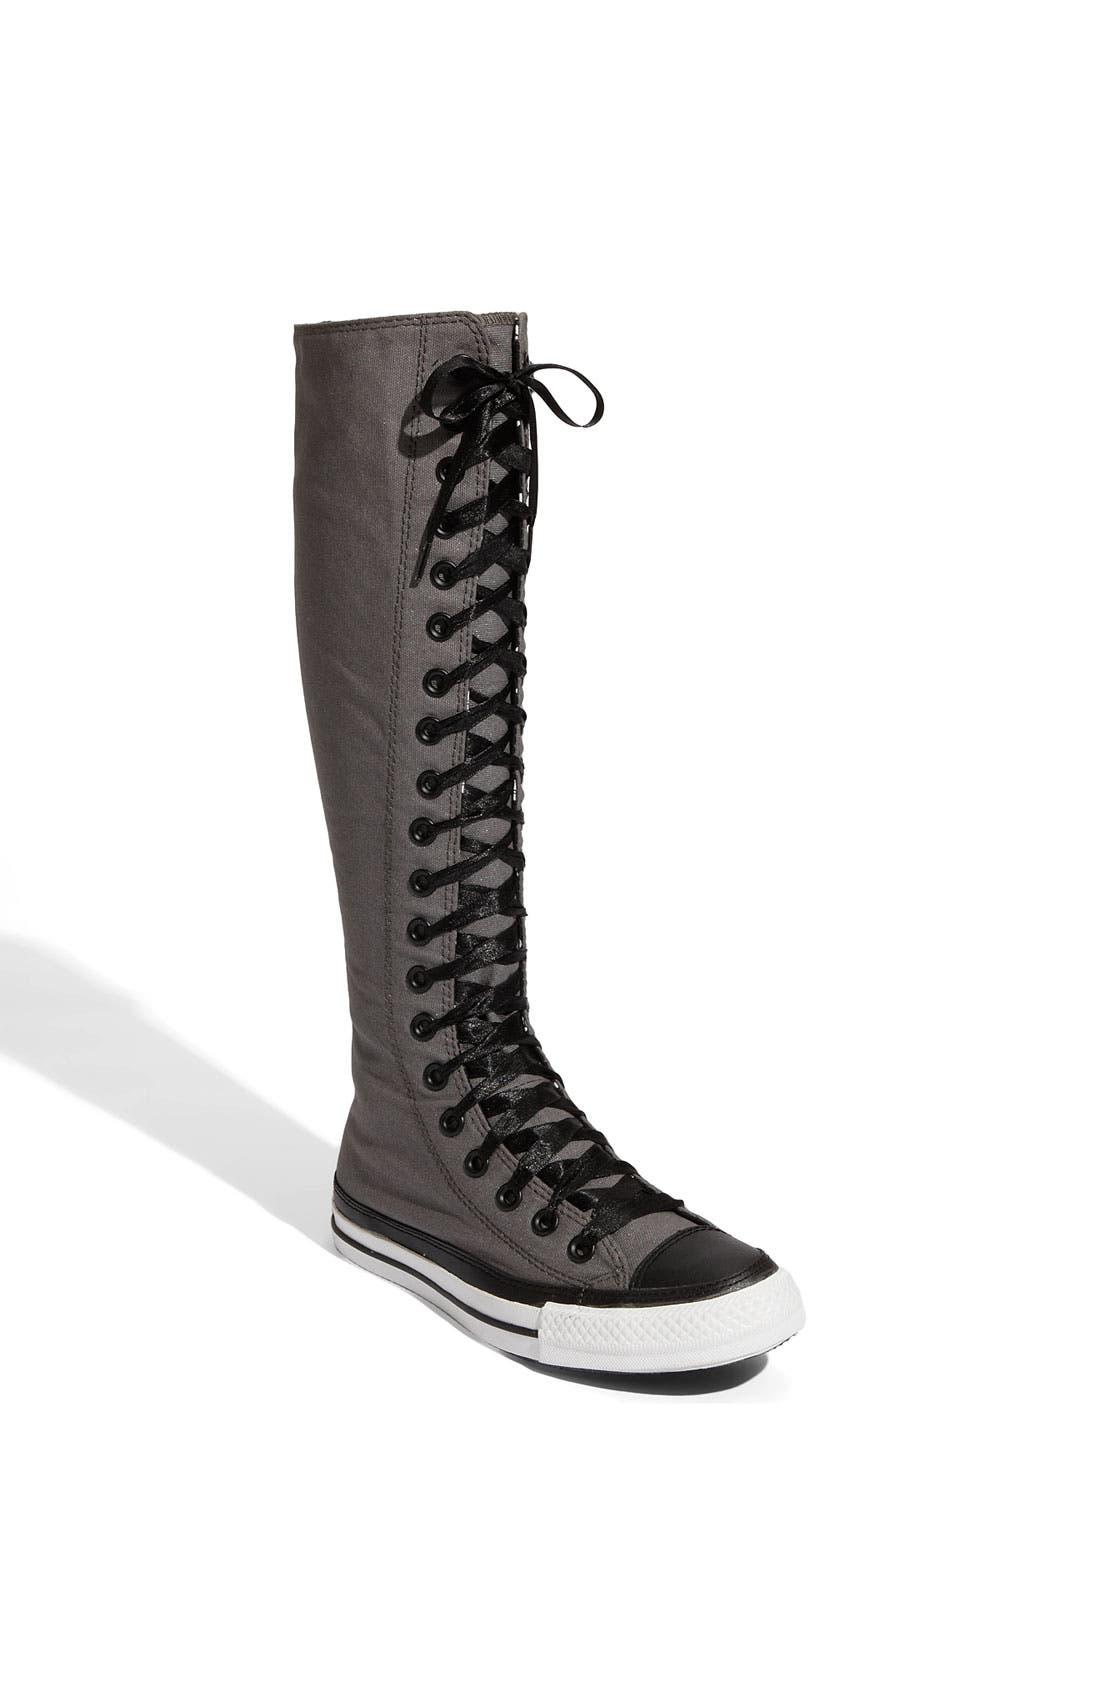 converse knee high boots. main image - converse chuck taylor® \u0027xx hi\u0027 knee high sneaker boots